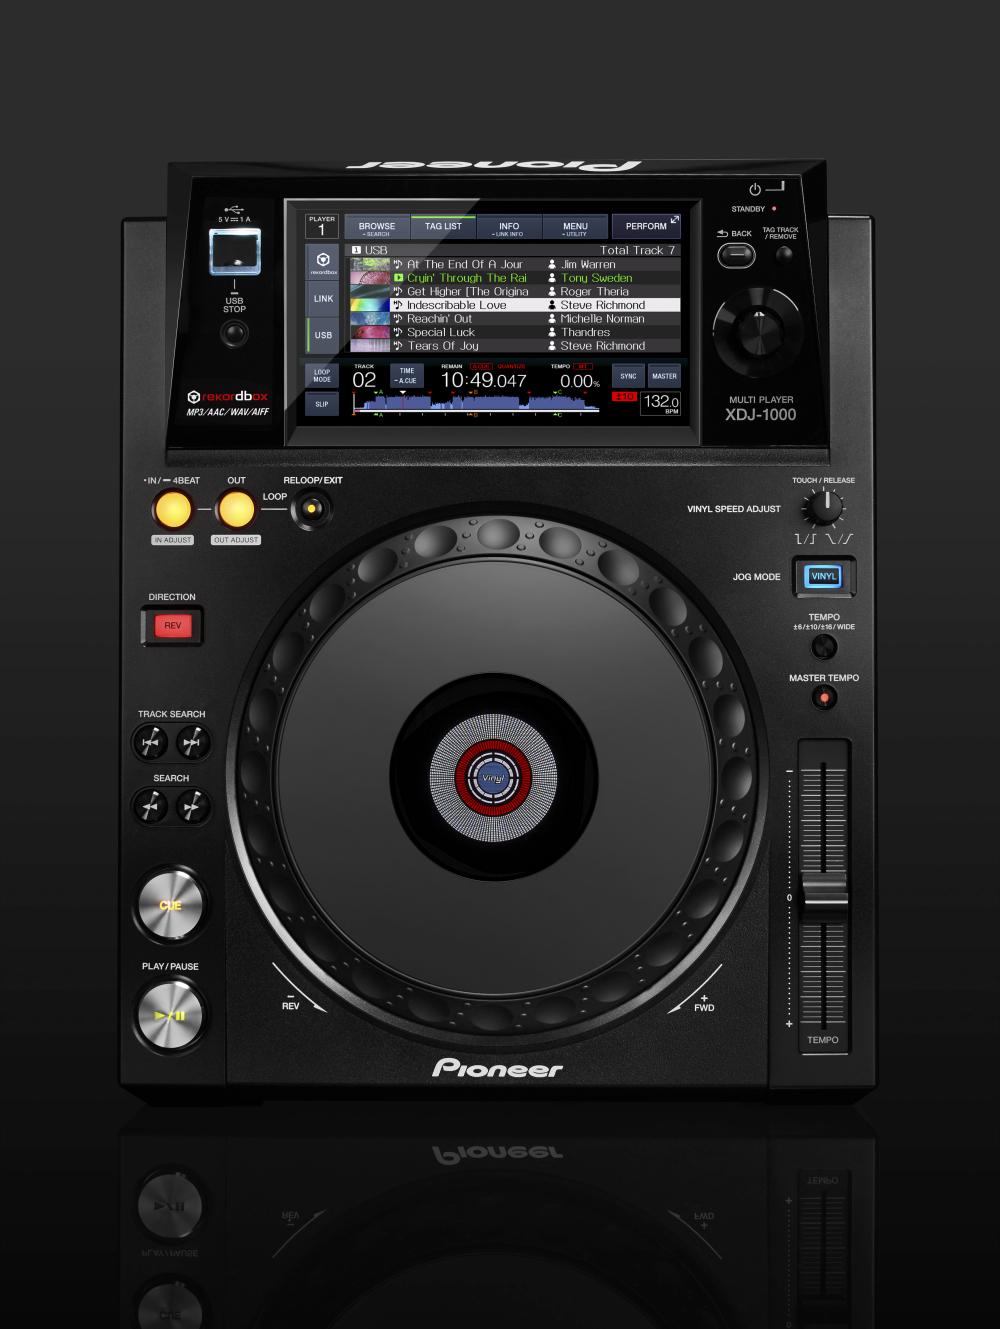 neu pioneer xdj 1000 mediaplayer deck ohne cd laufwerk. Black Bedroom Furniture Sets. Home Design Ideas